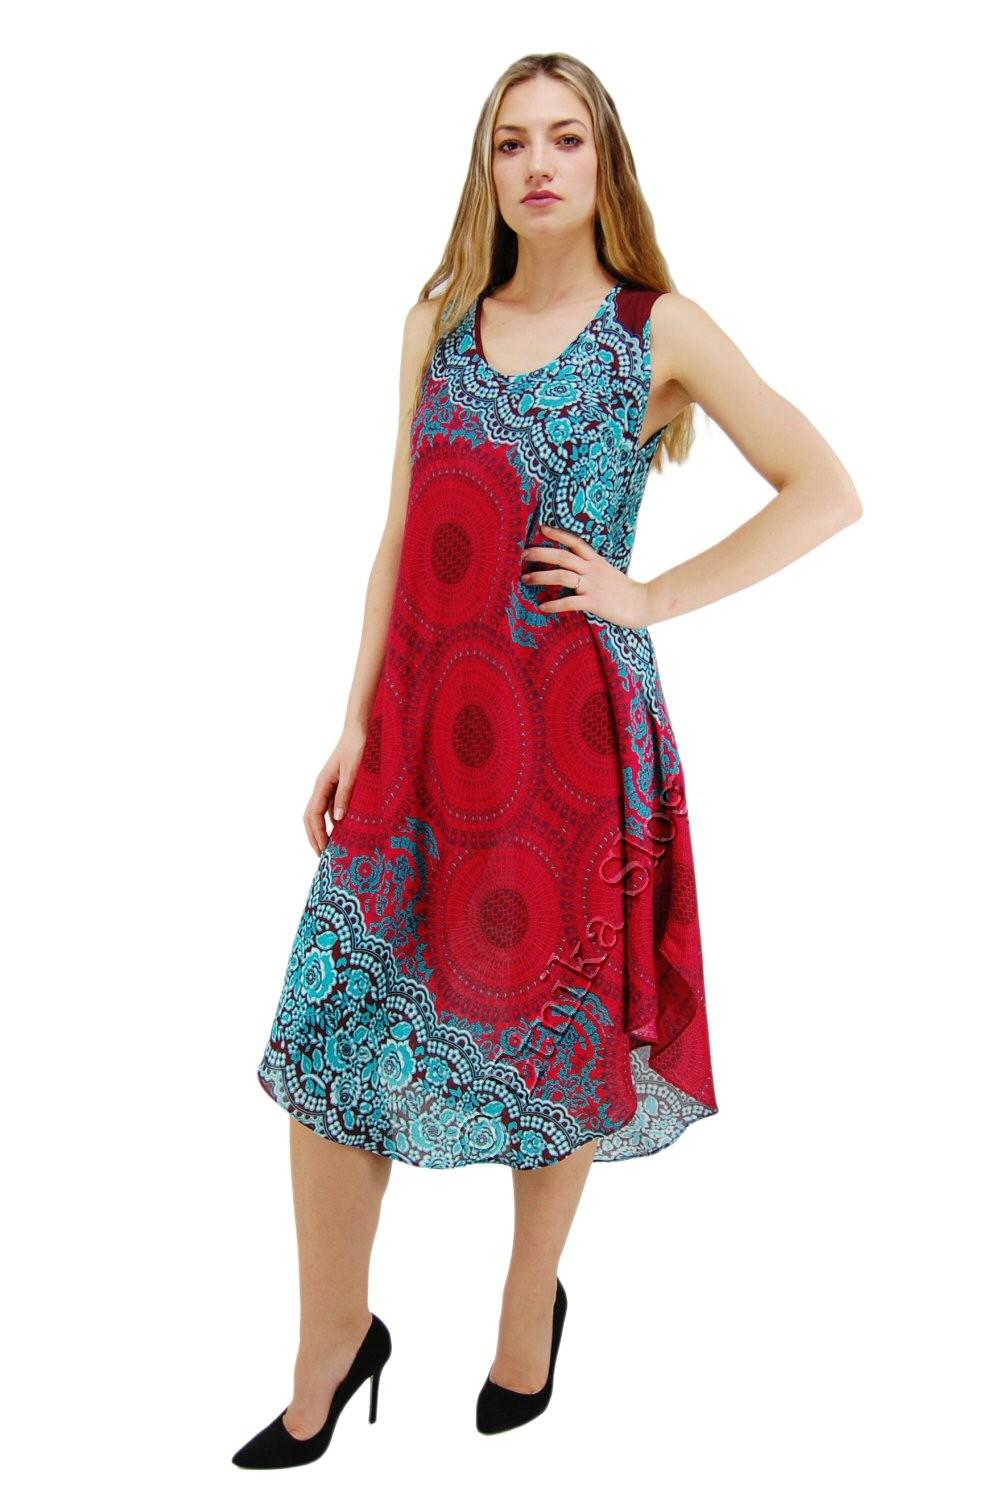 VISCOSE SUMMER DRESSES AB-BCV15CF - Oriente Import S.r.l.